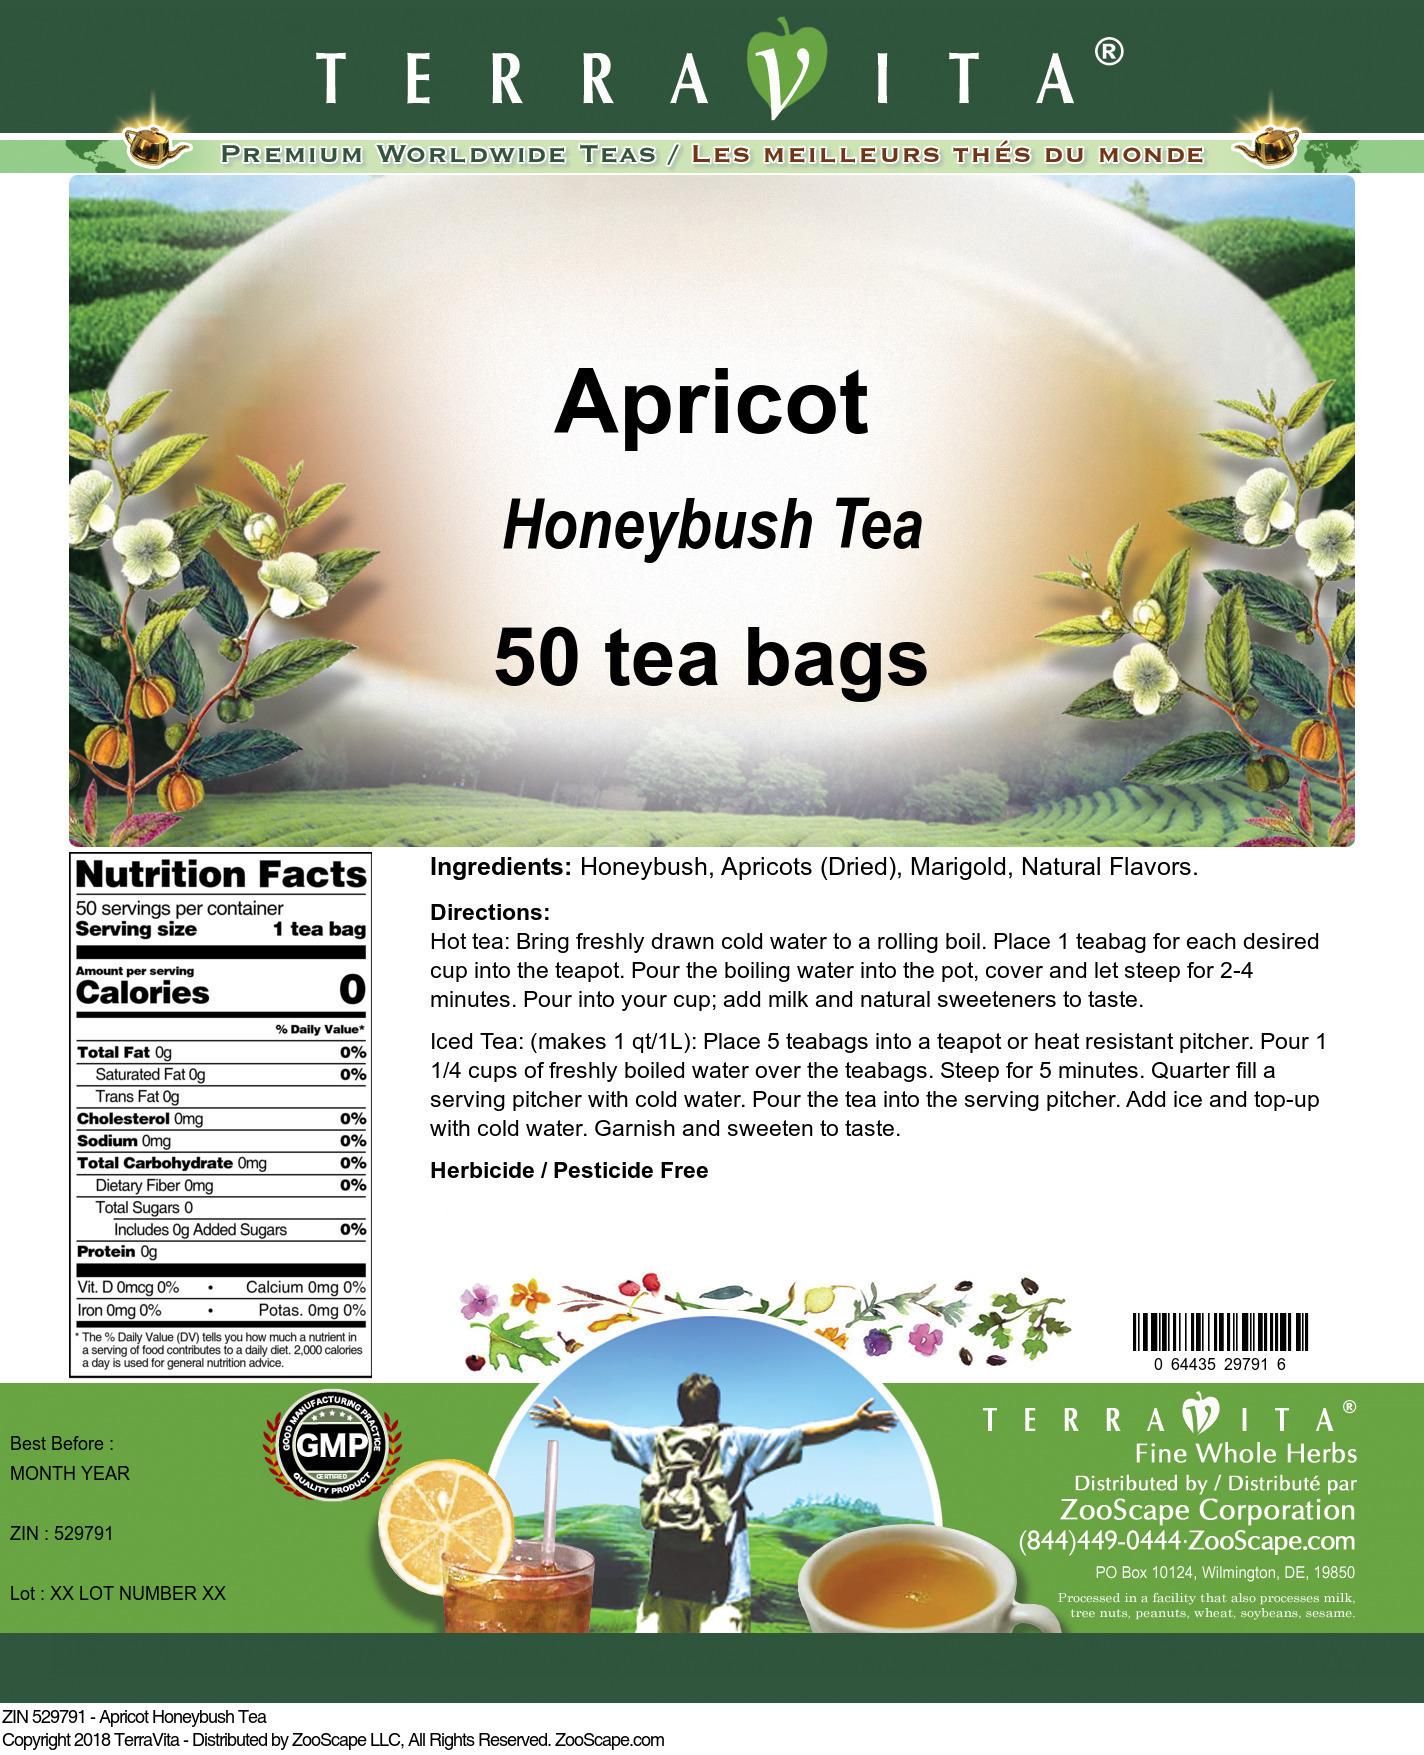 Apricot Honeybush Tea